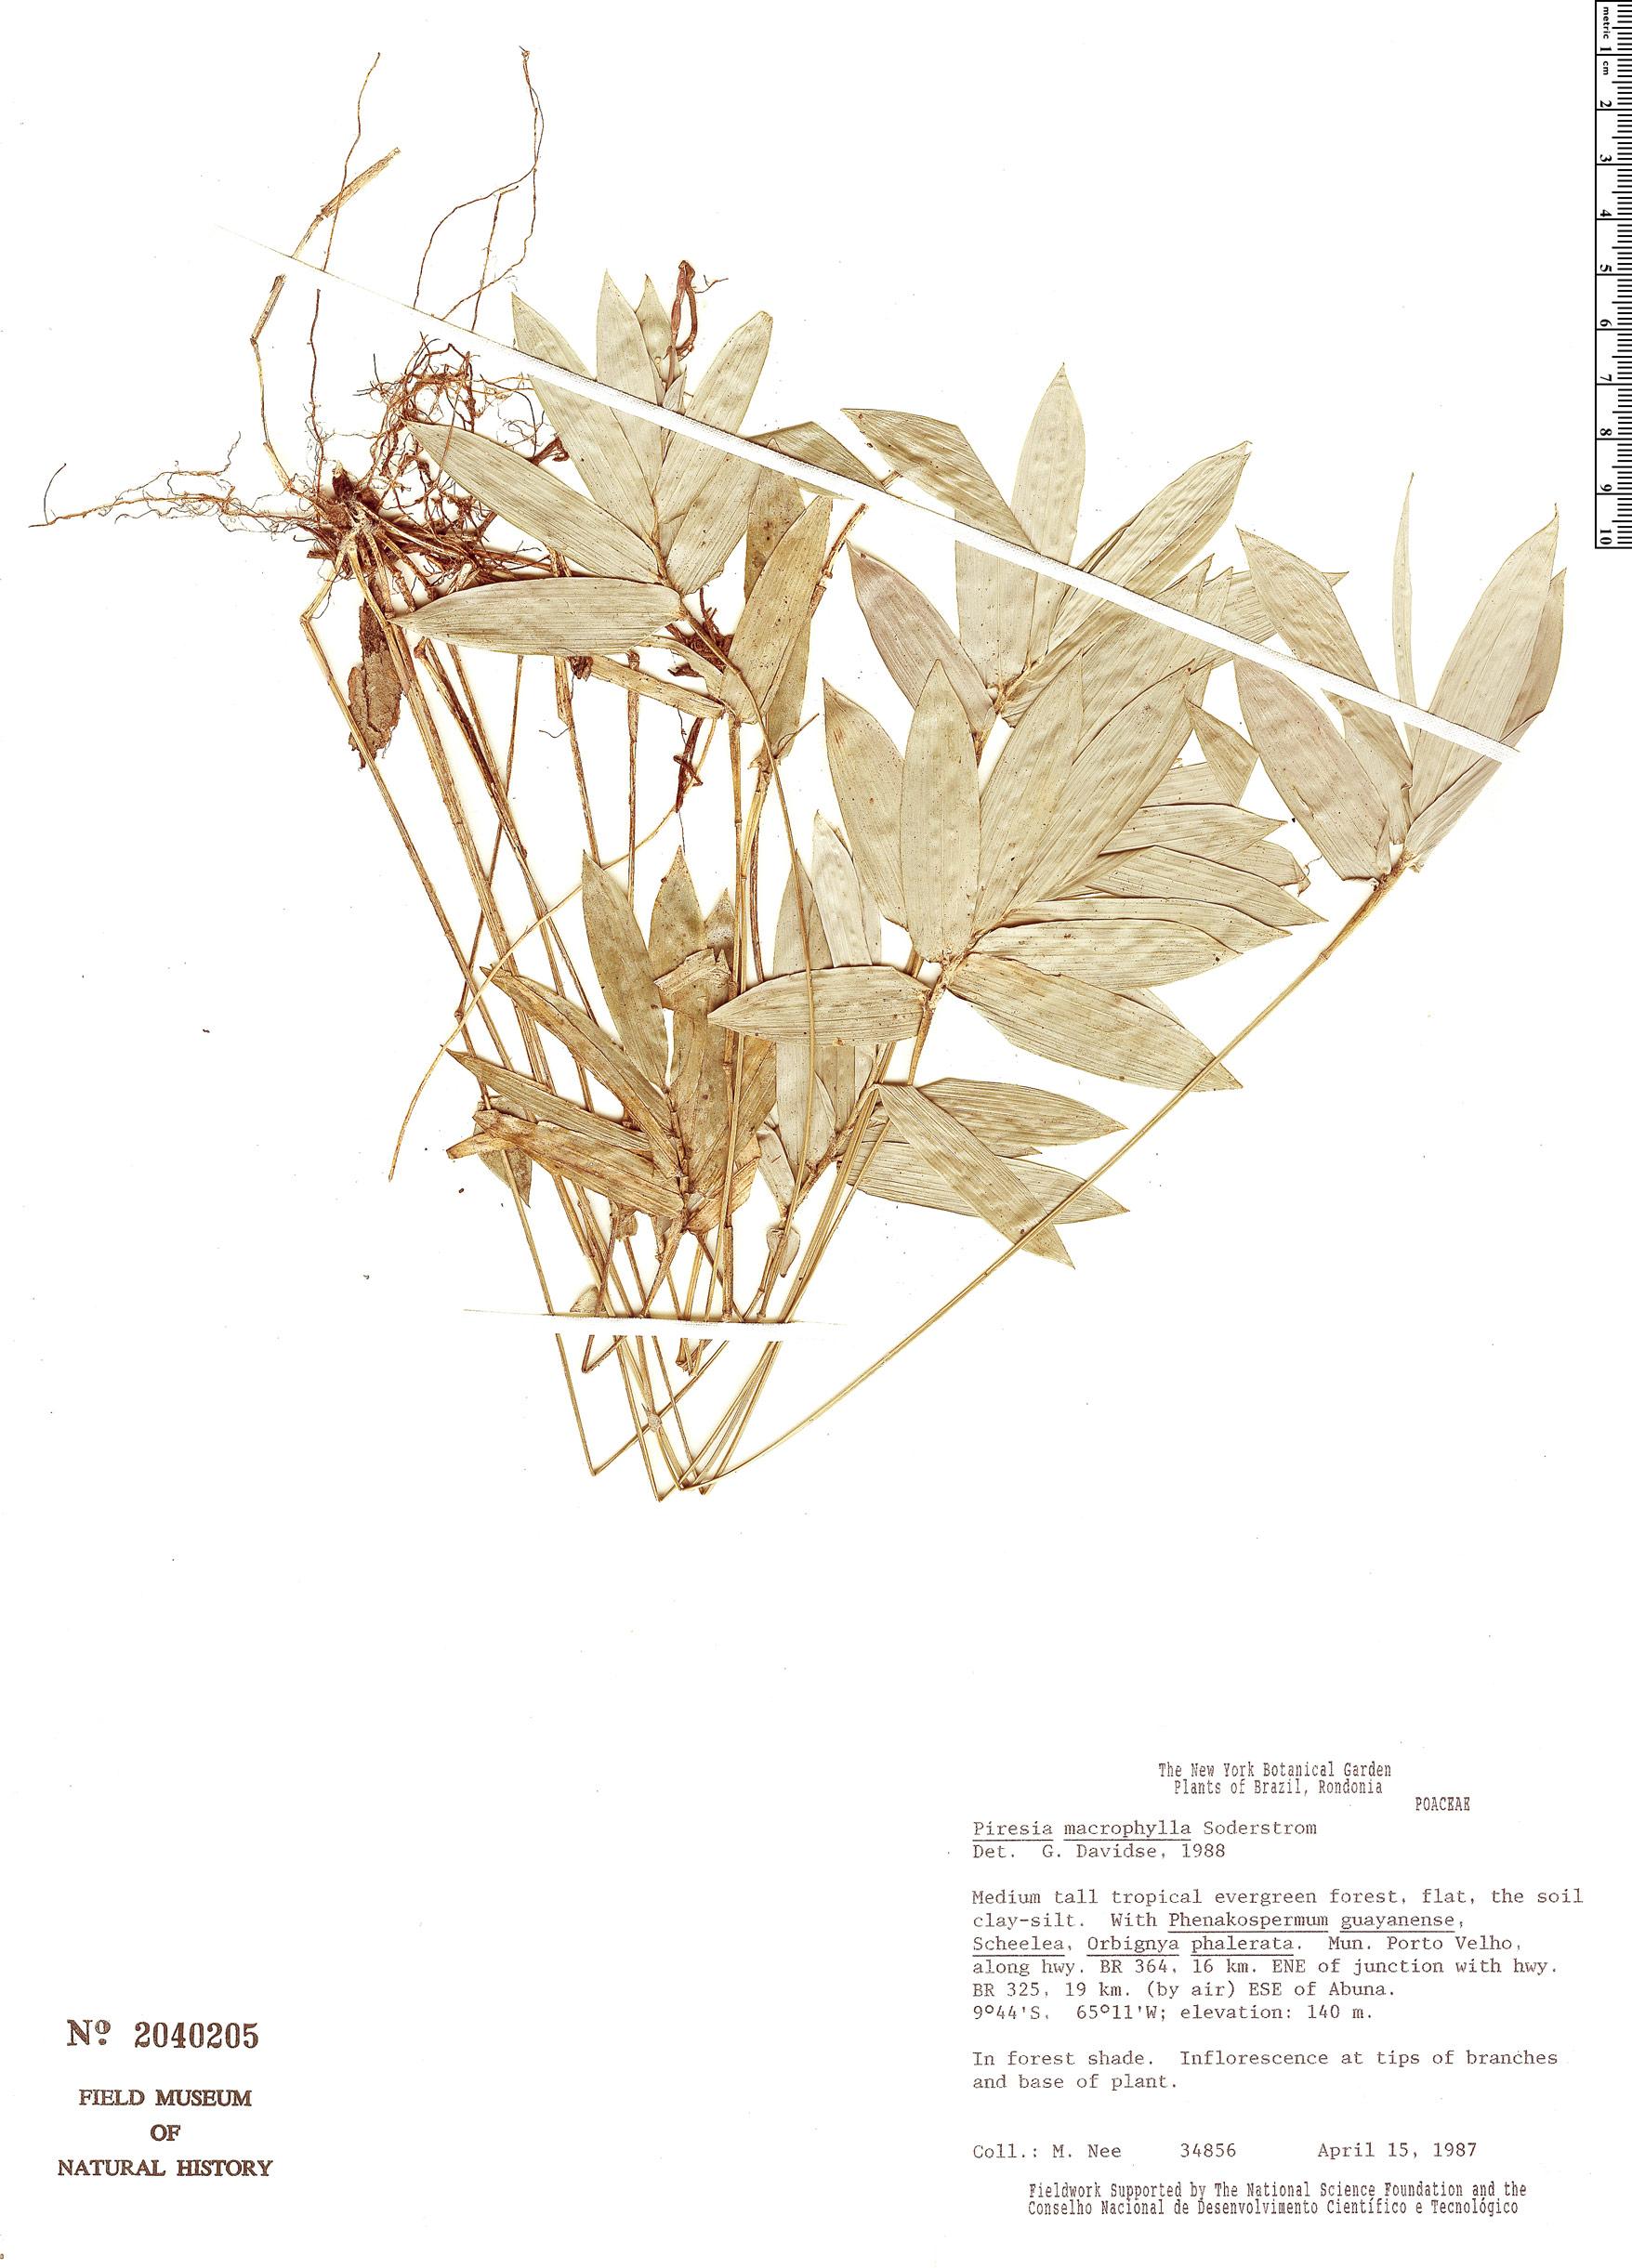 Specimen: Piresia macrophylla